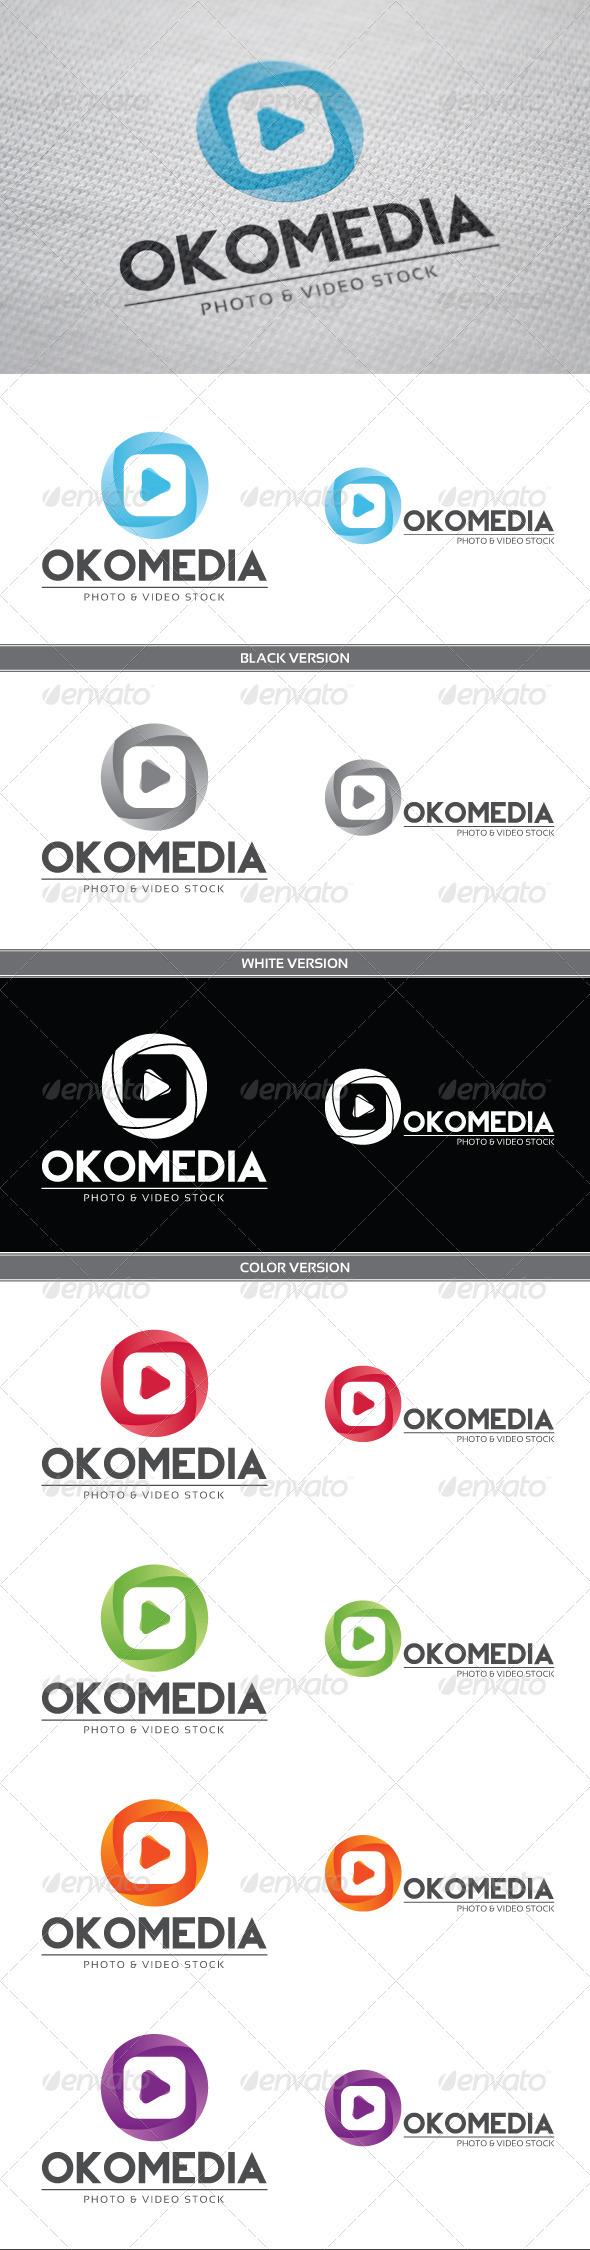 GraphicRiver Okomedia Logo 3798415